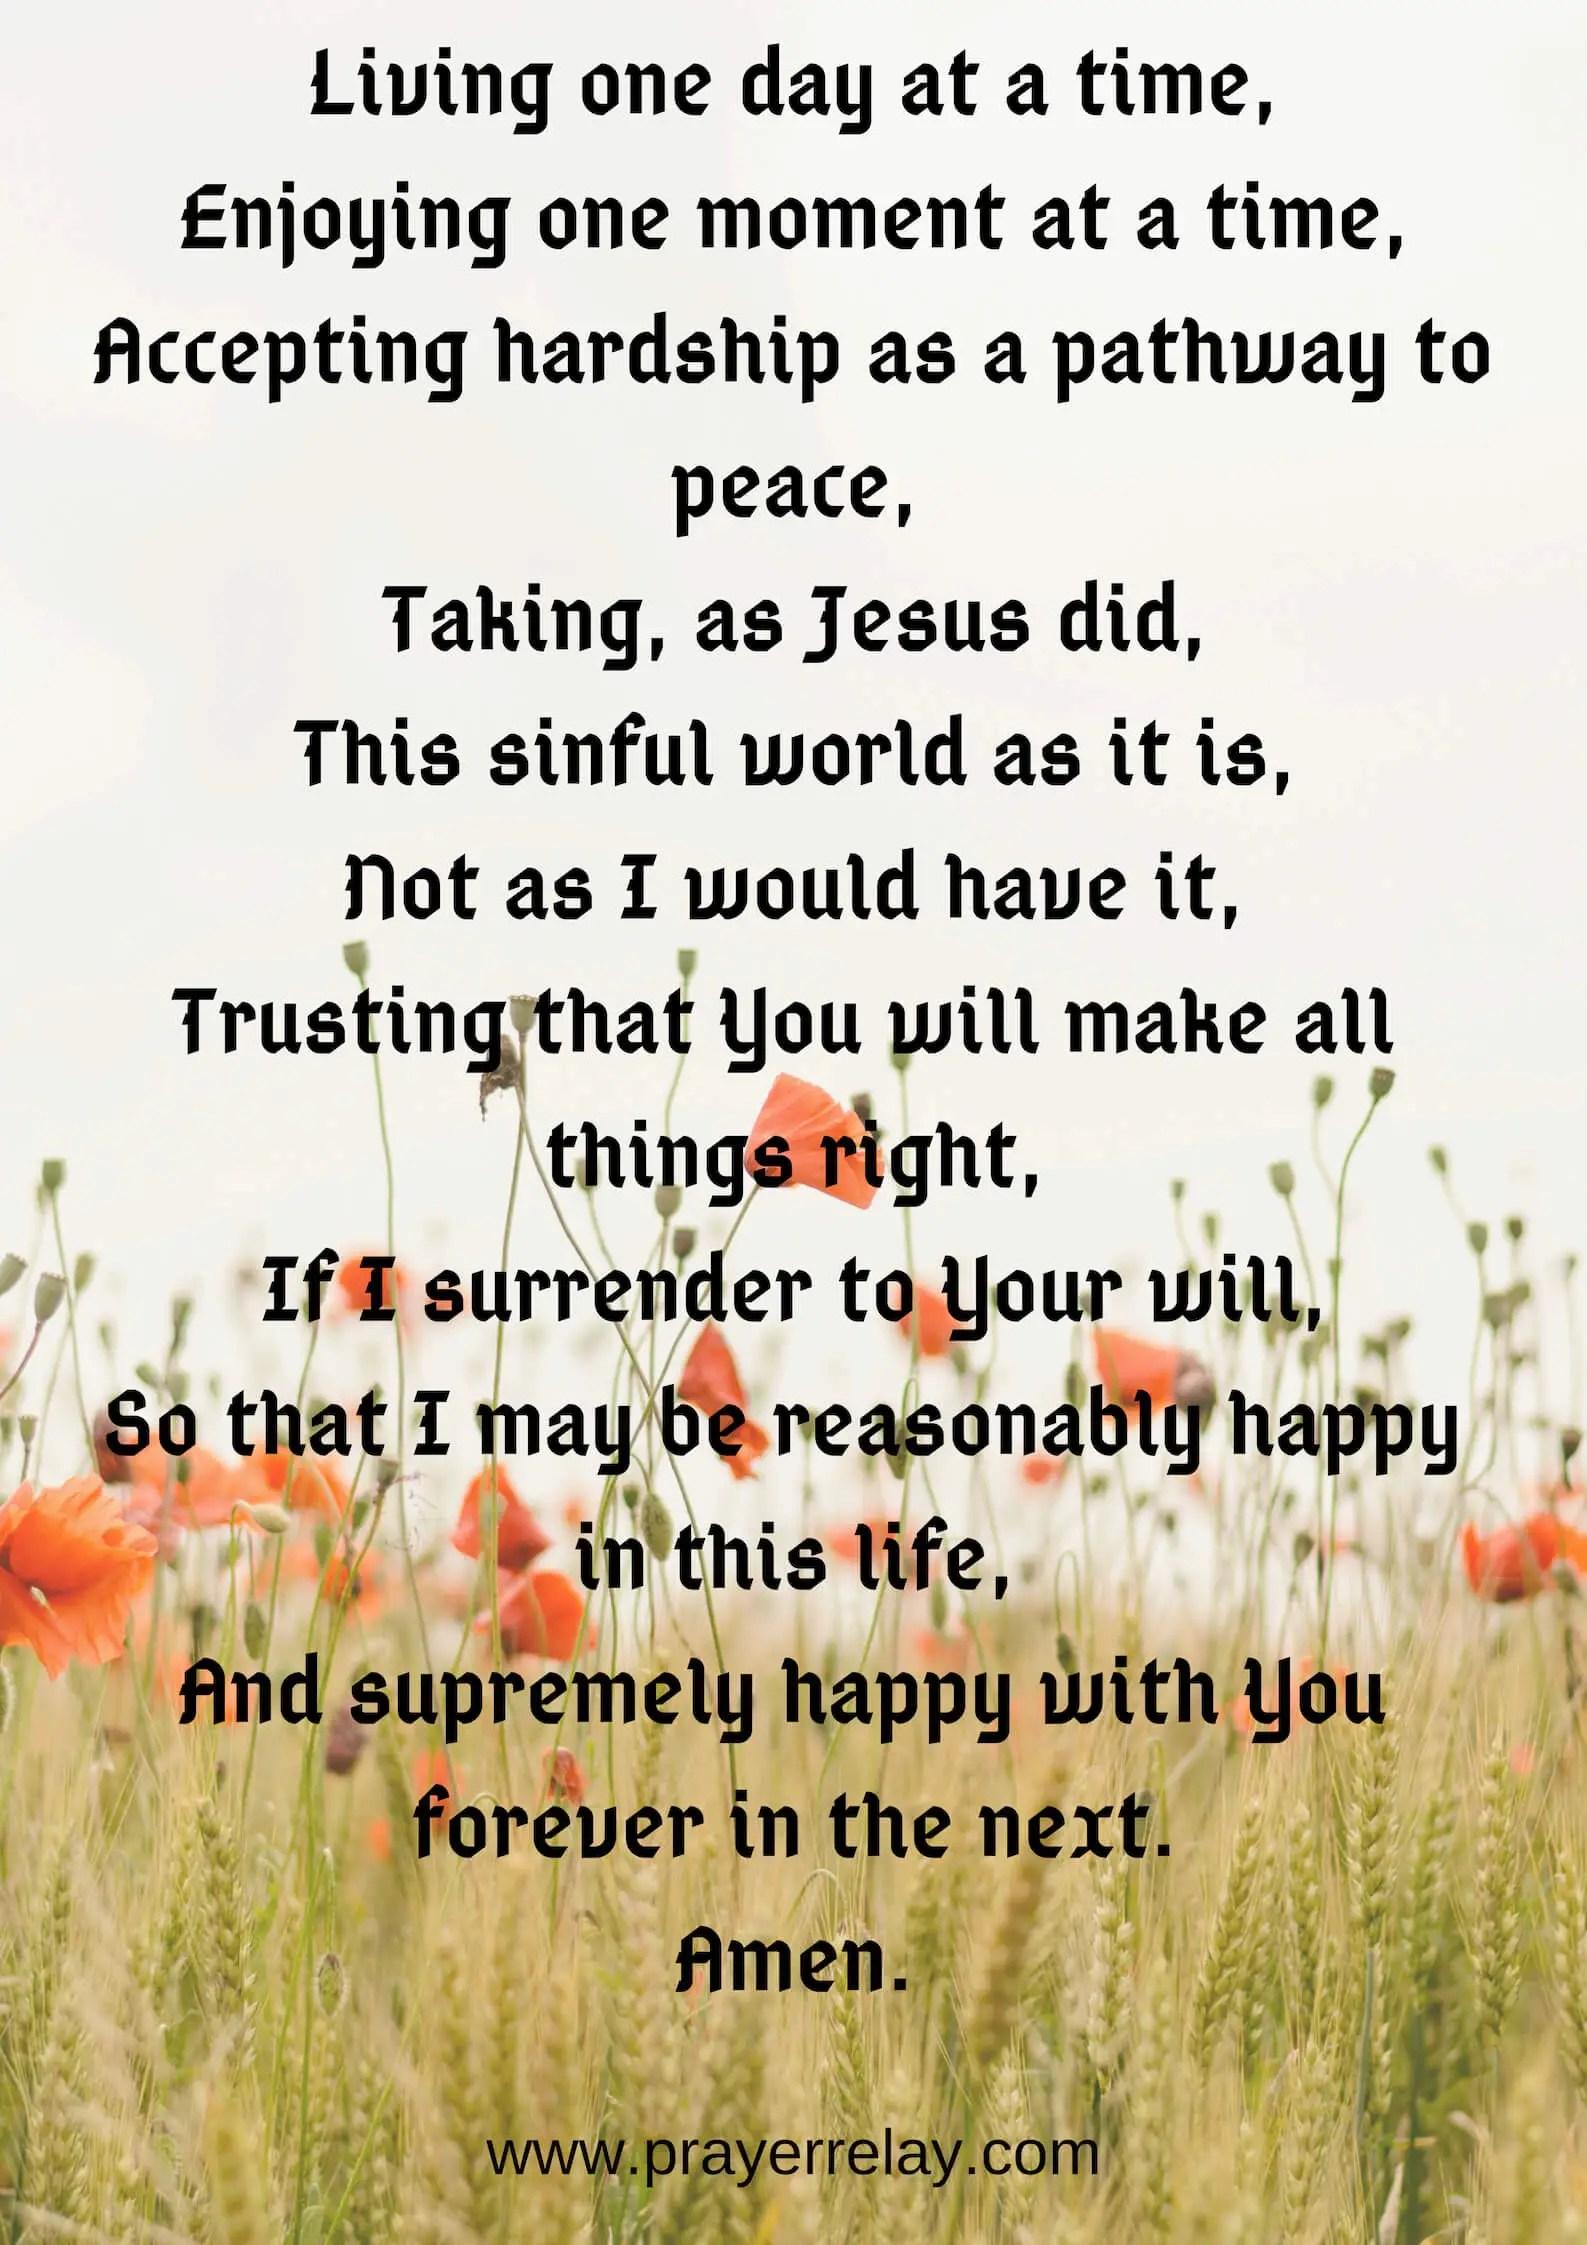 Serenity prayer quotes2